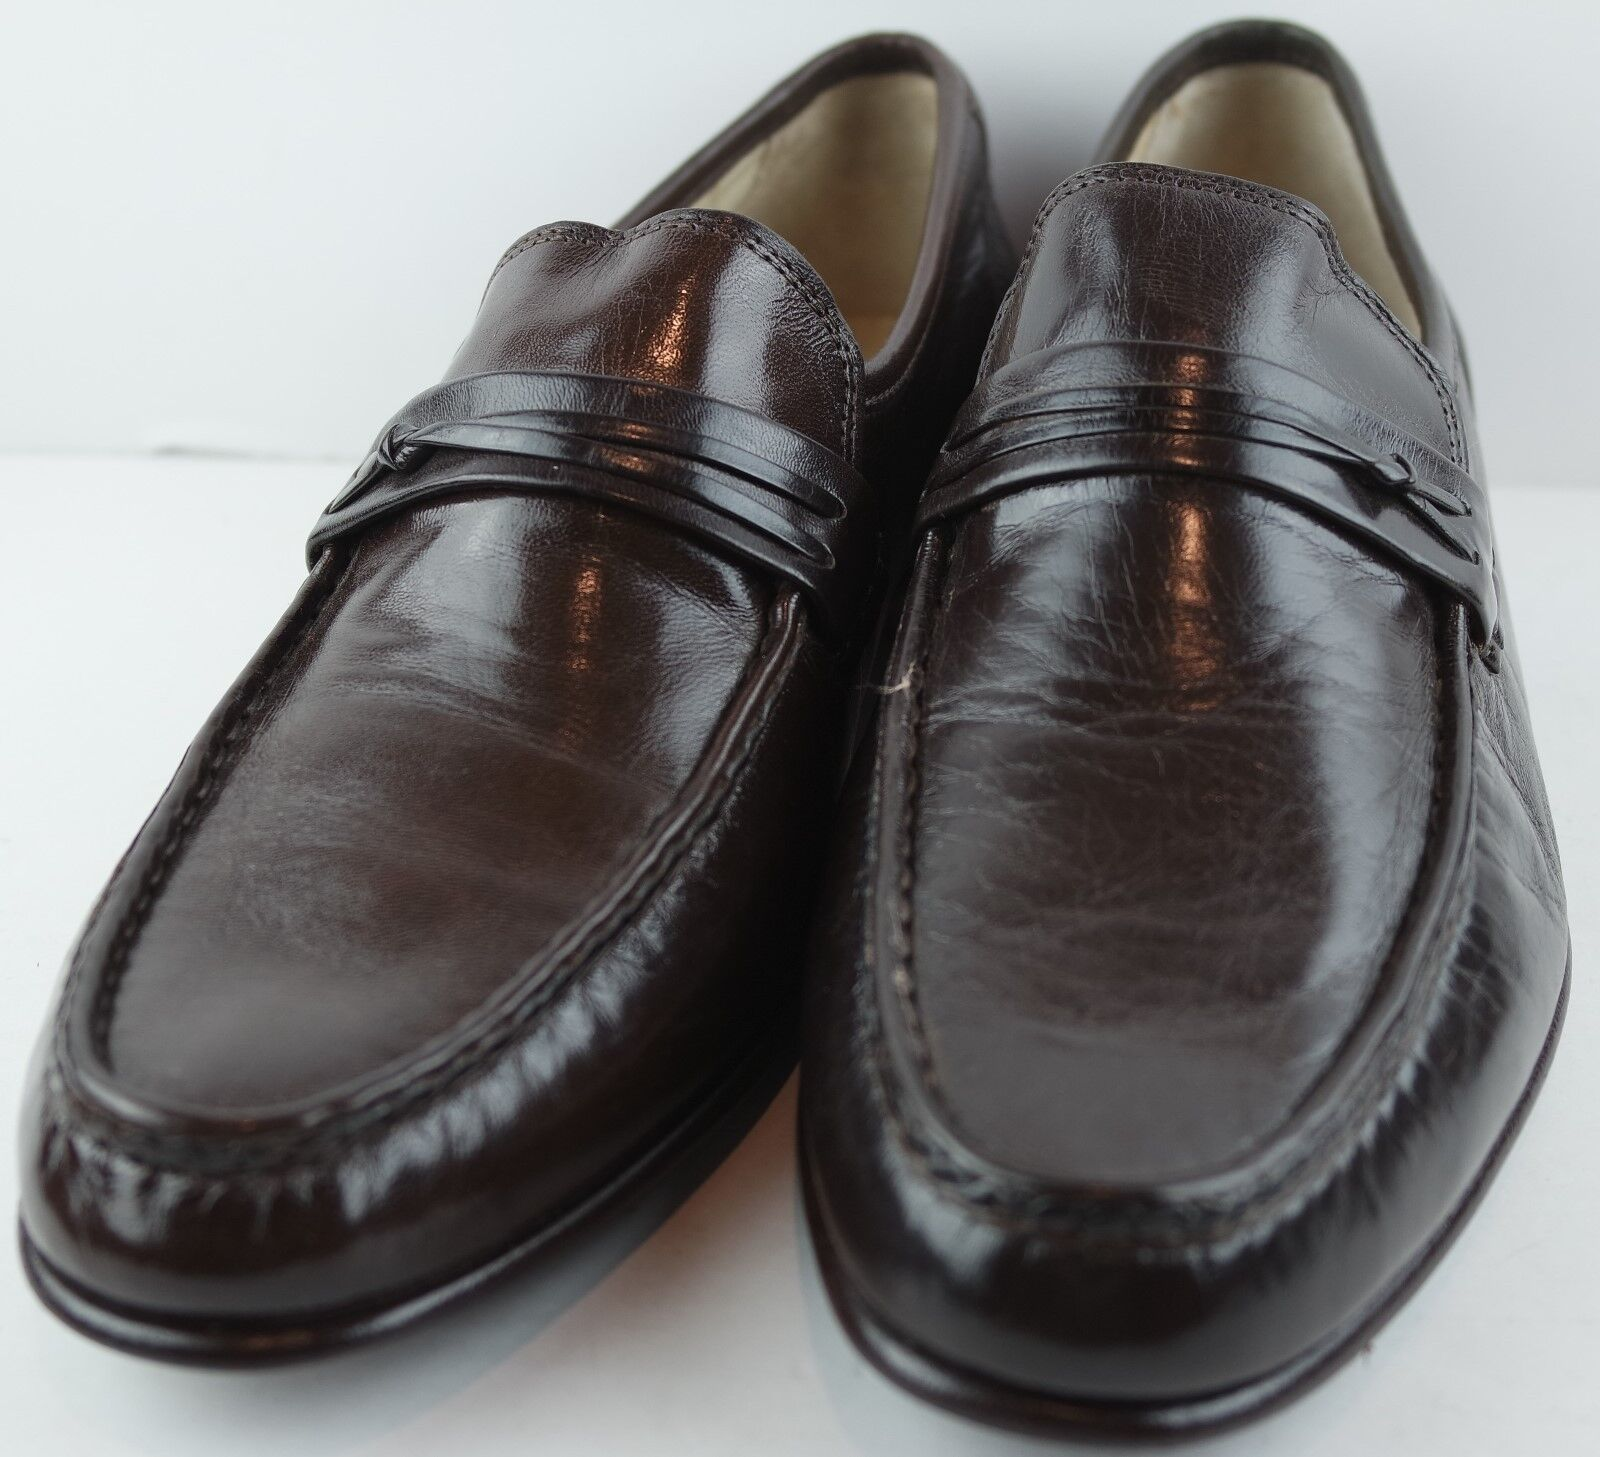 DANIELE FERRADINI Mens braun Leather Loafers Loafers Loafers  Made Größe 10 N 92fbc9